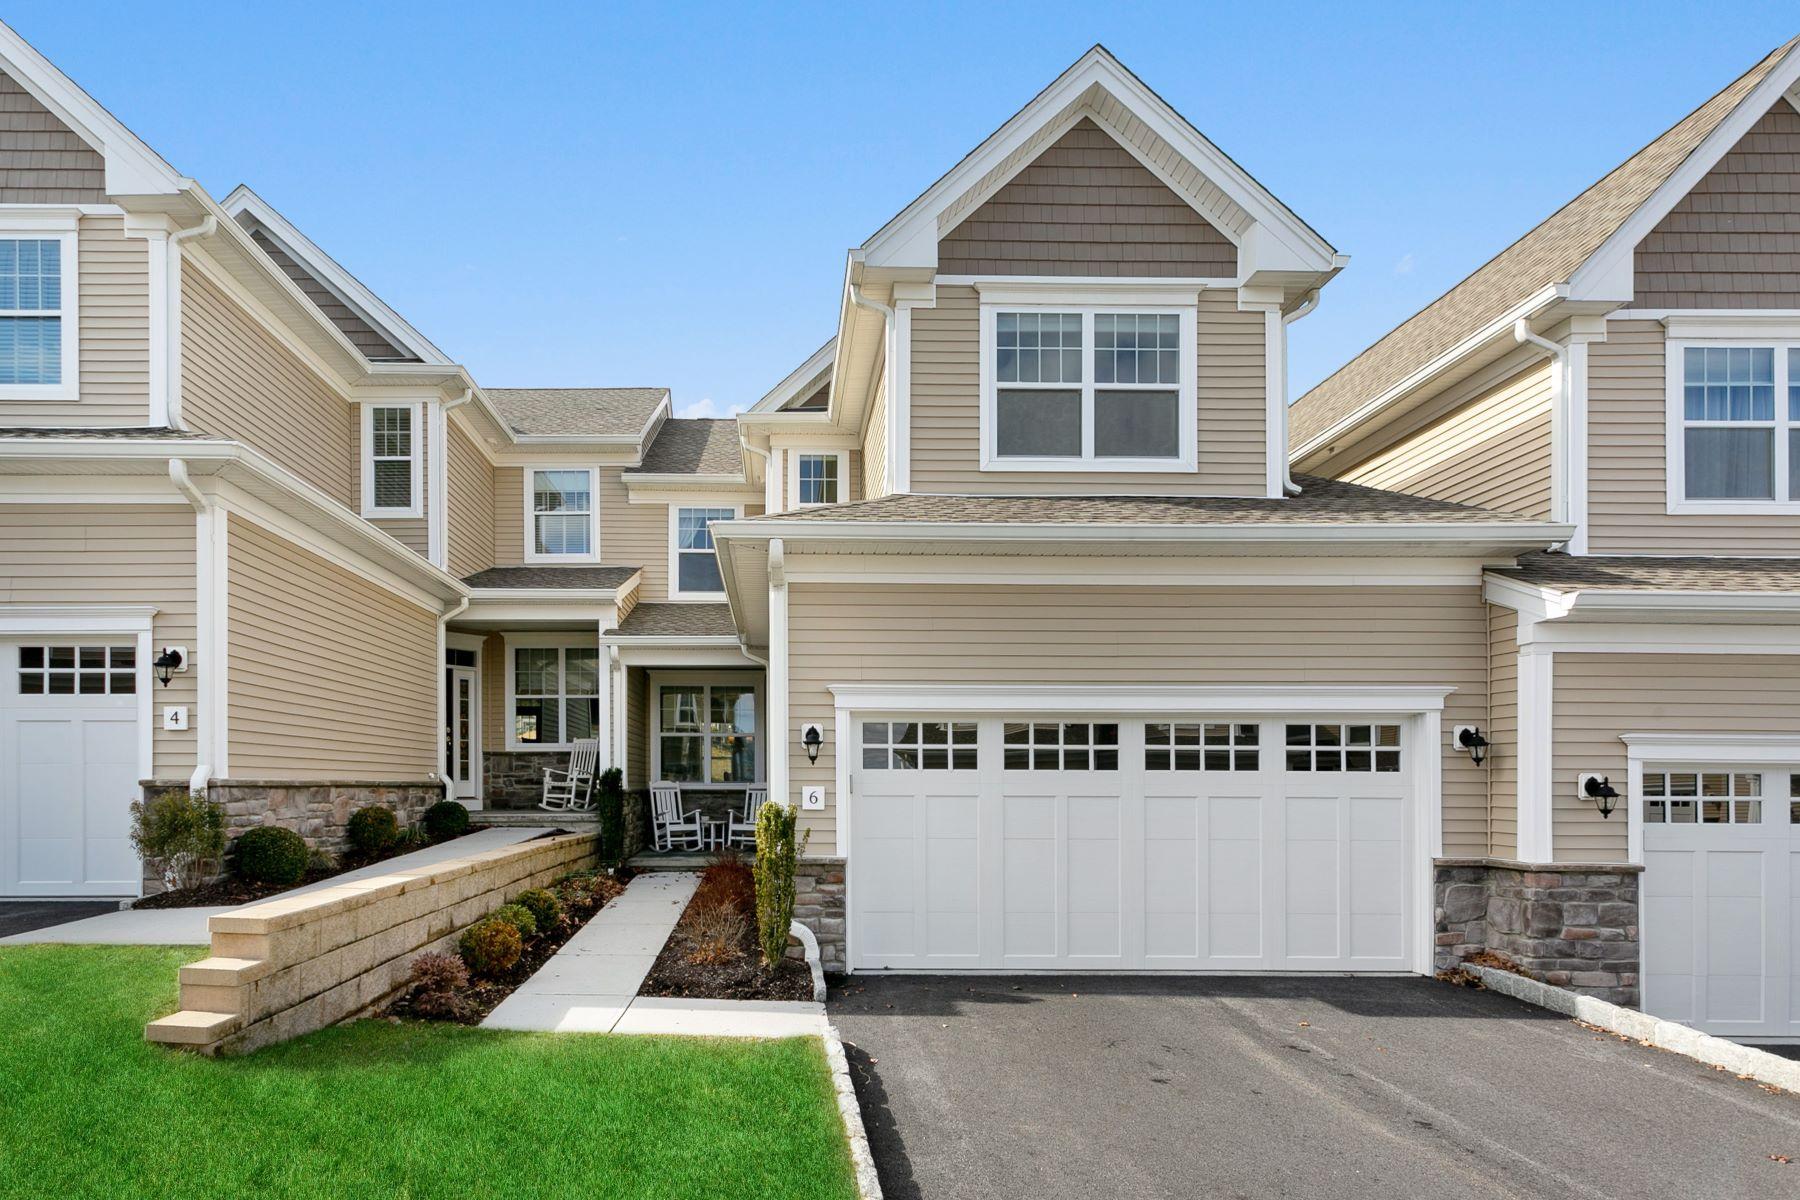 townhouses para Venda às Stunning Portman Model 6 Winding Ridge Way 6, Danbury, Connecticut 06810 Estados Unidos